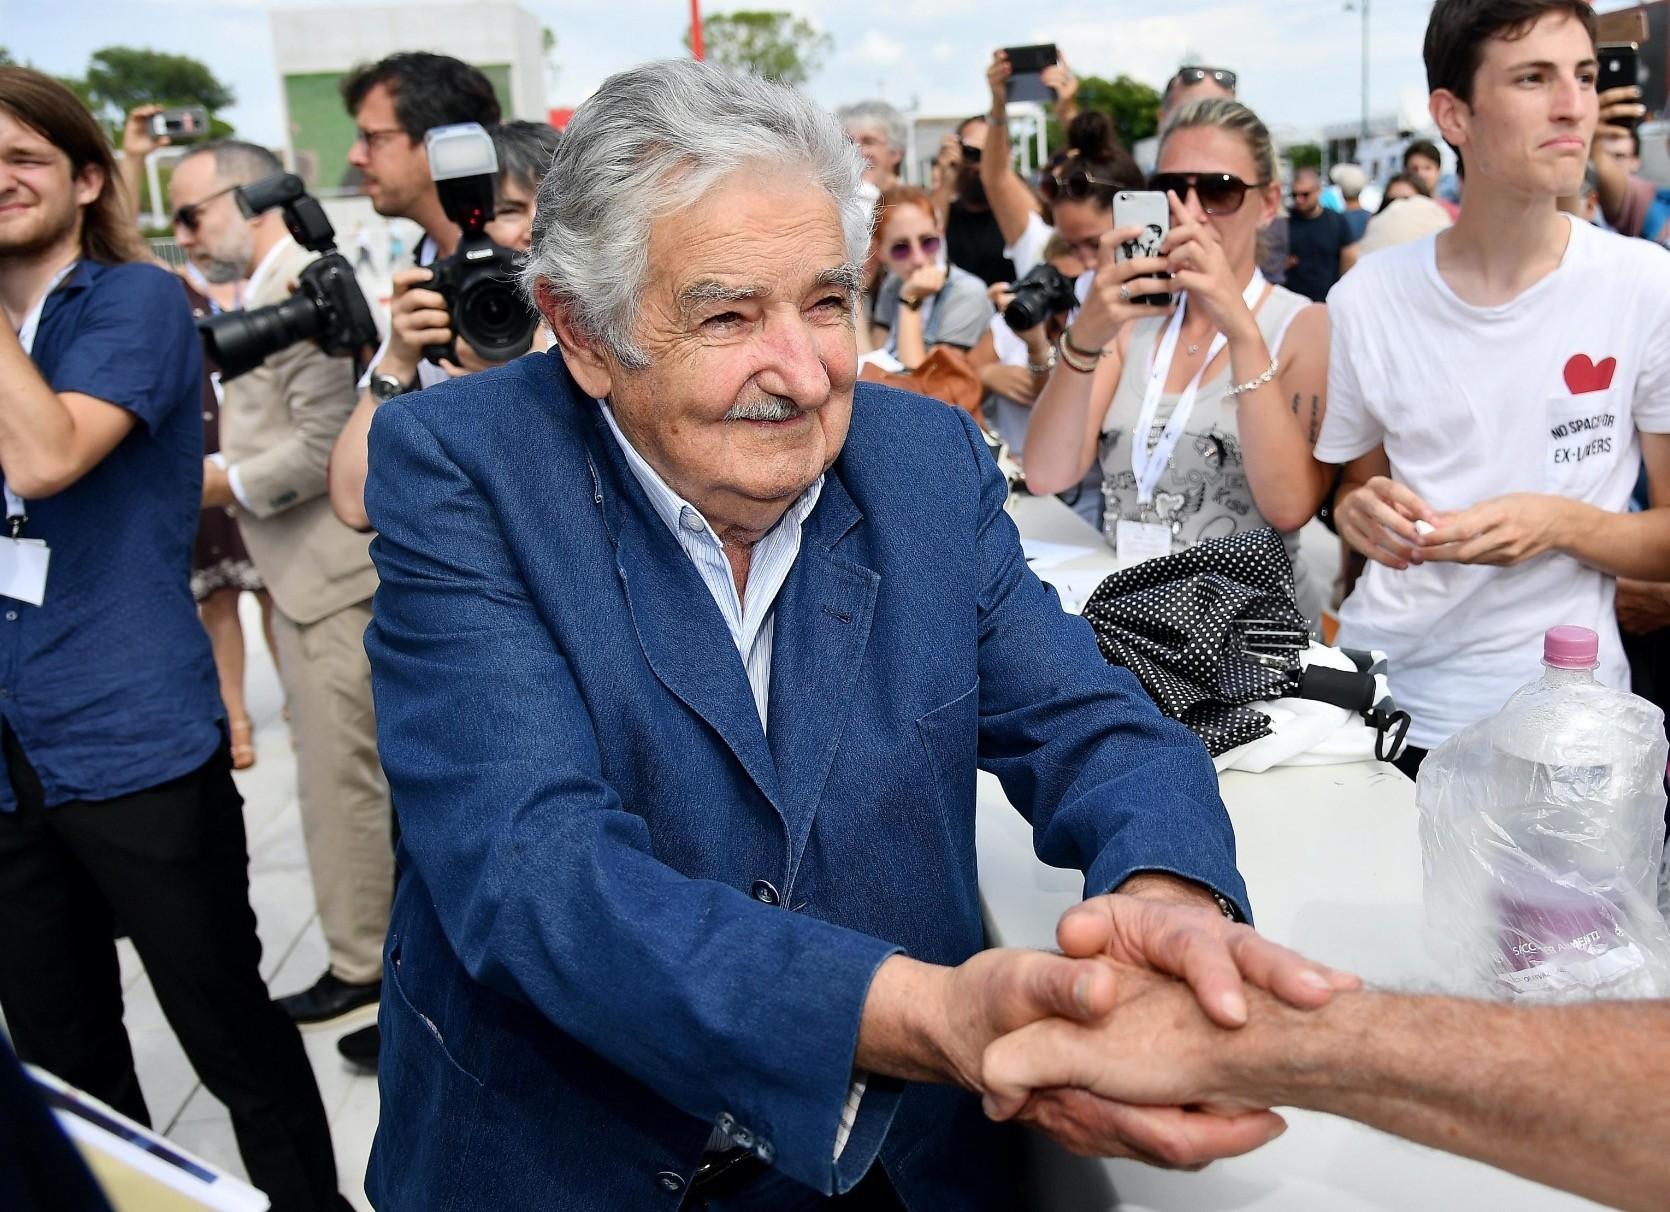 Former Uruguayan President Jose Mujica signs autographs and shakes hands of fans as he arrives for the premiere of u2018El Pepe, Una Vida Suprema.u201d